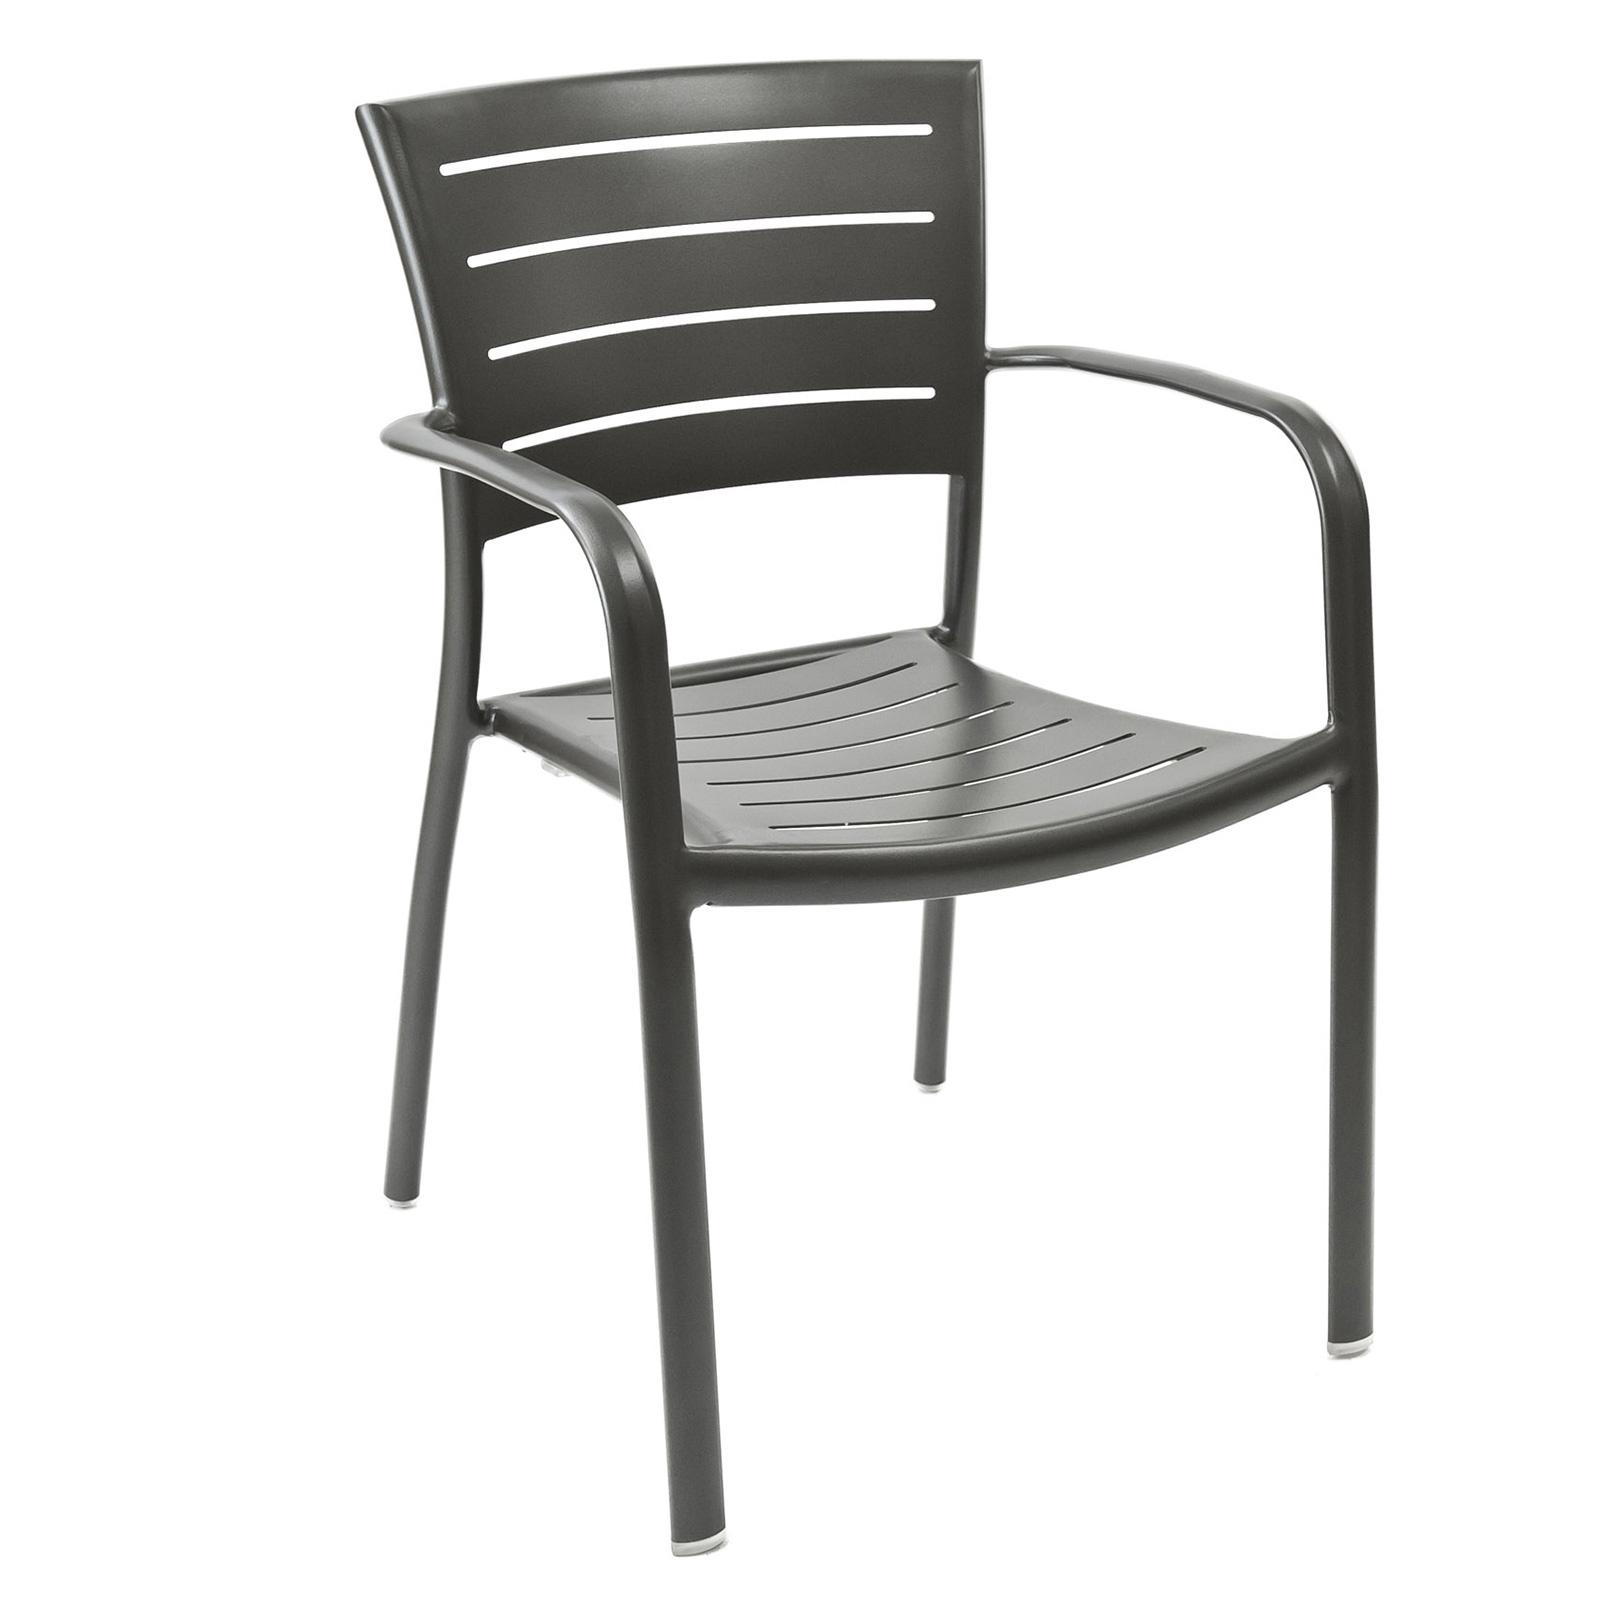 Florida Seating AL-5000 A BRONZE chair, armchair, outdoor